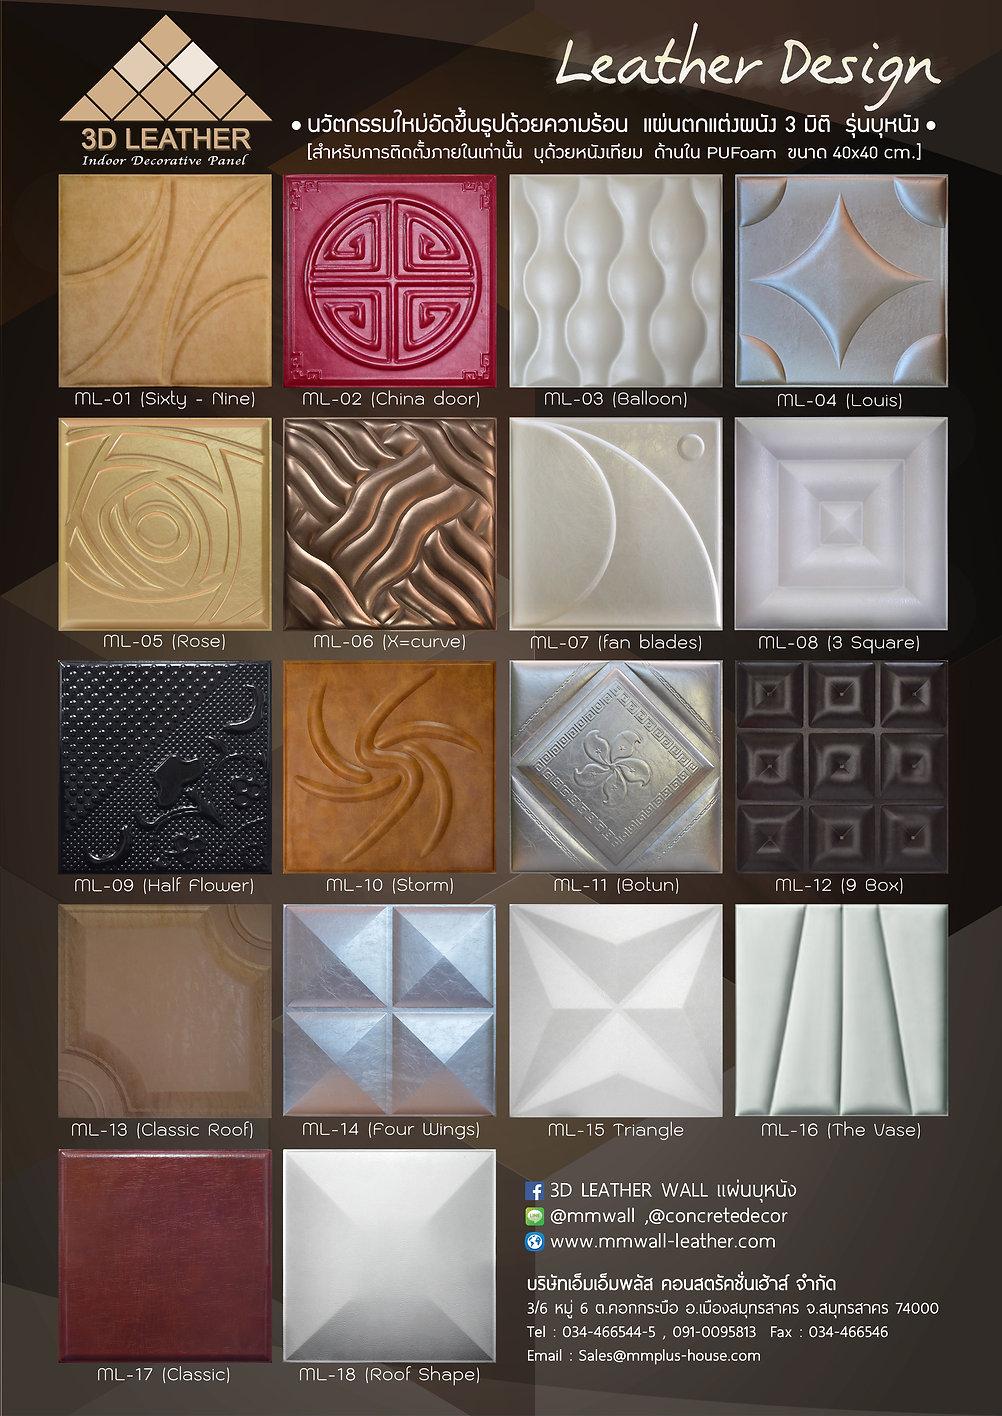 leather Items01.jpg